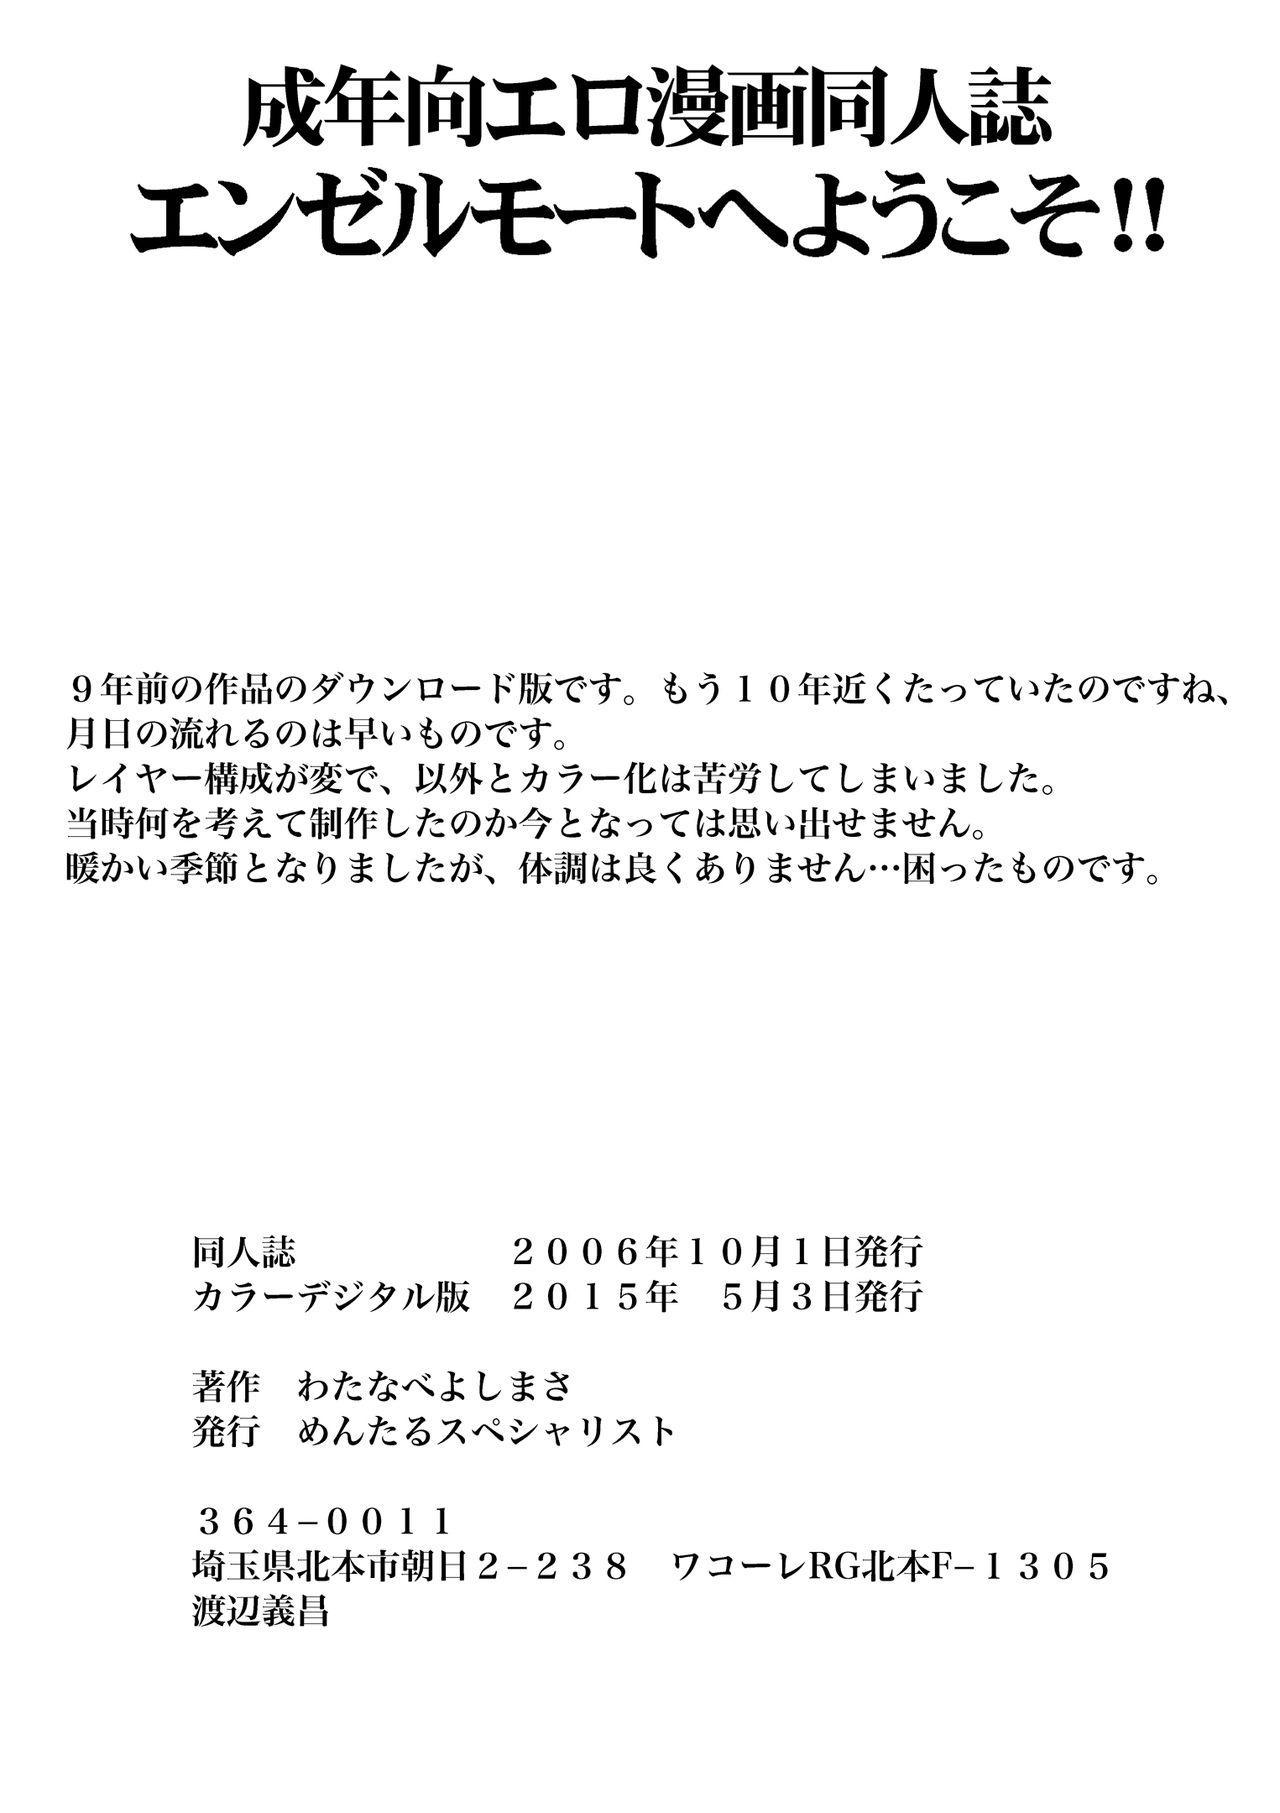 [Mental Specialist] Welcome to Angel Mort! (Higurashi No Naku Koro Ni) Clothes Version 43